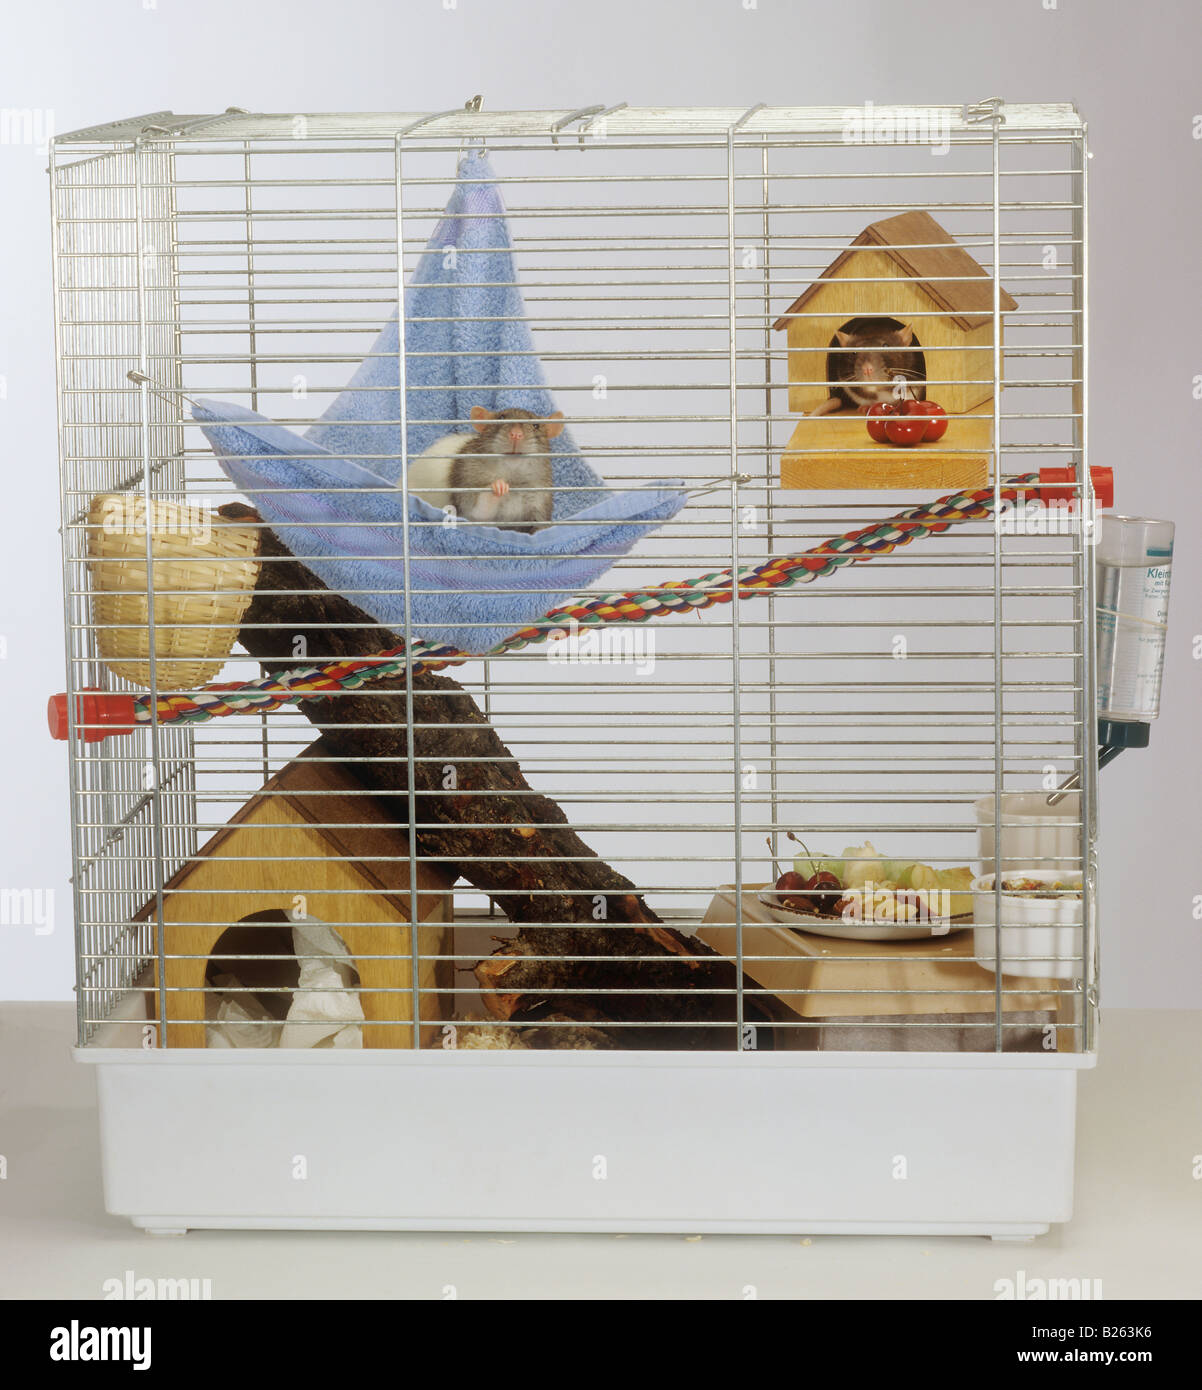 Cage Stockfotos & Cage Bilder - Alamy